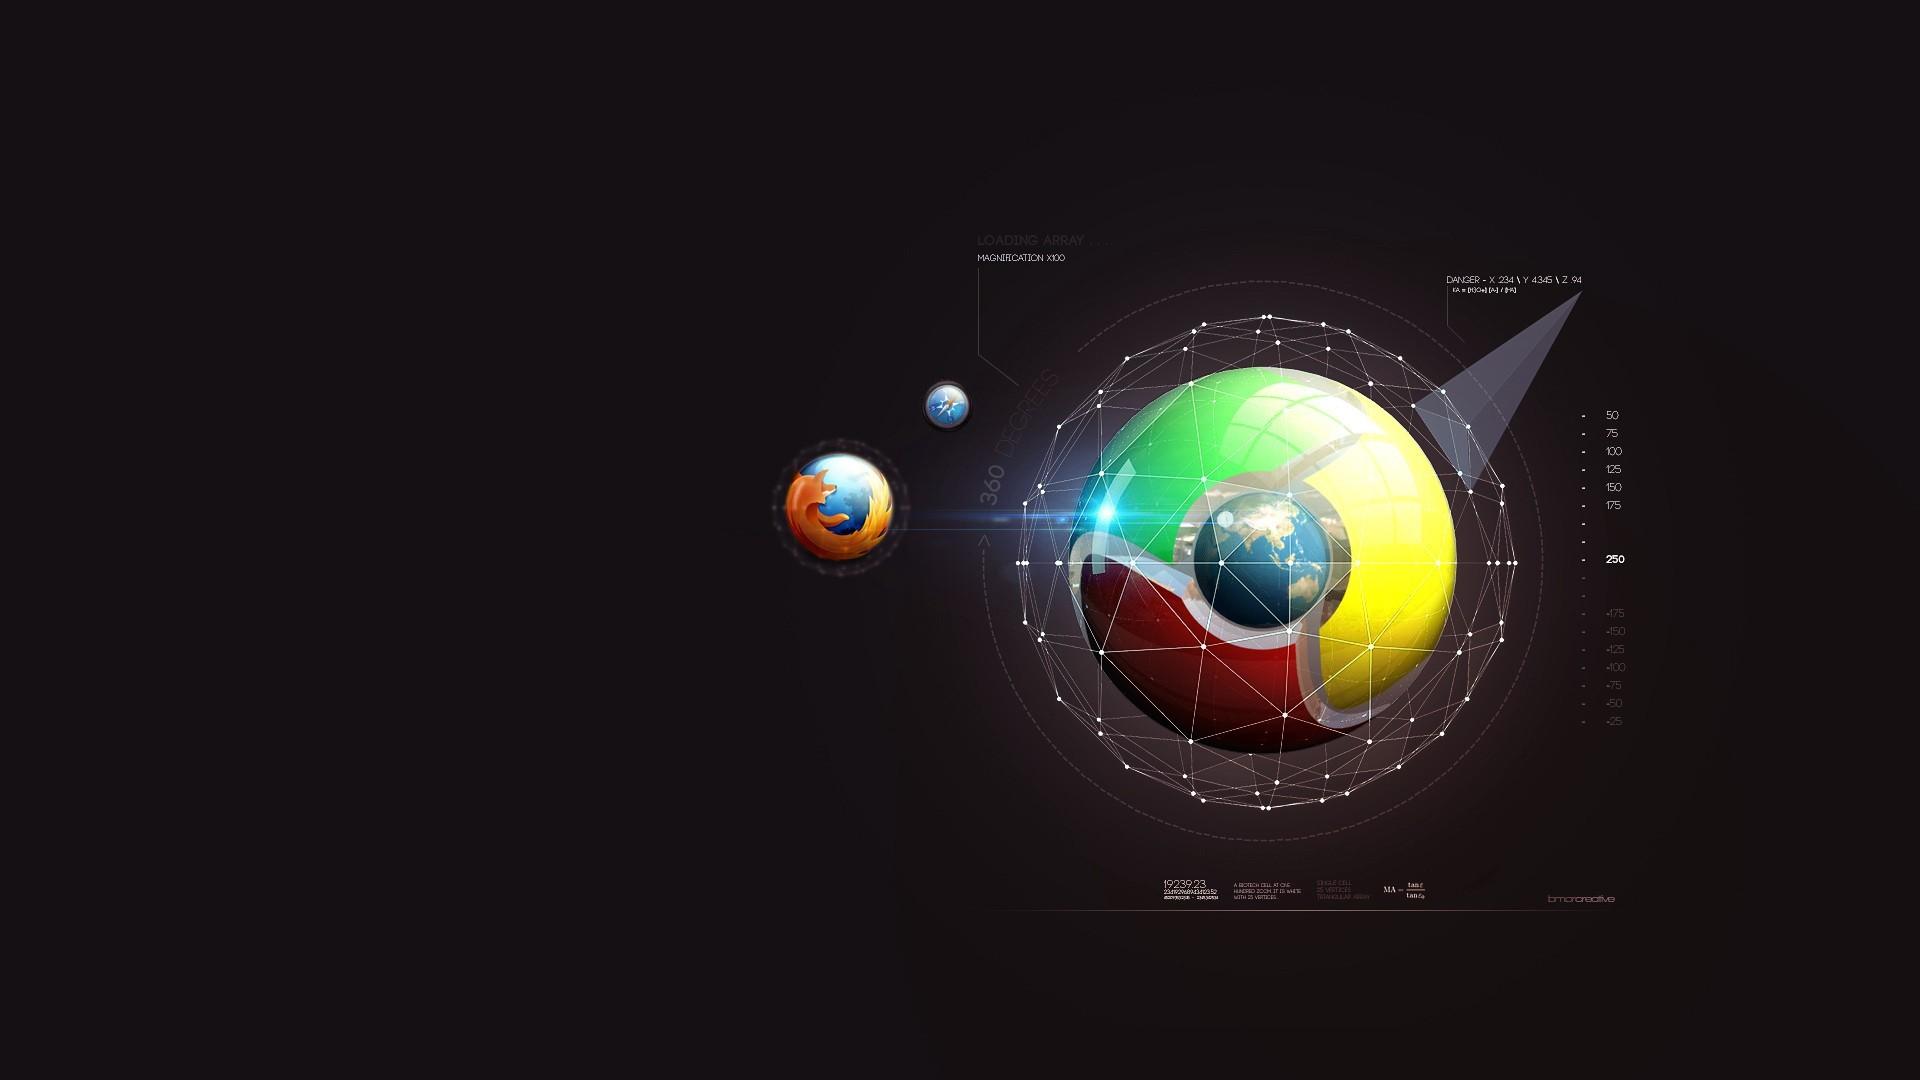 Illustration Planet Space Minimalism Vehicle Earth Circle Ball Mozilla Firefox Google Chrome Screenshot 1920x1080 Px